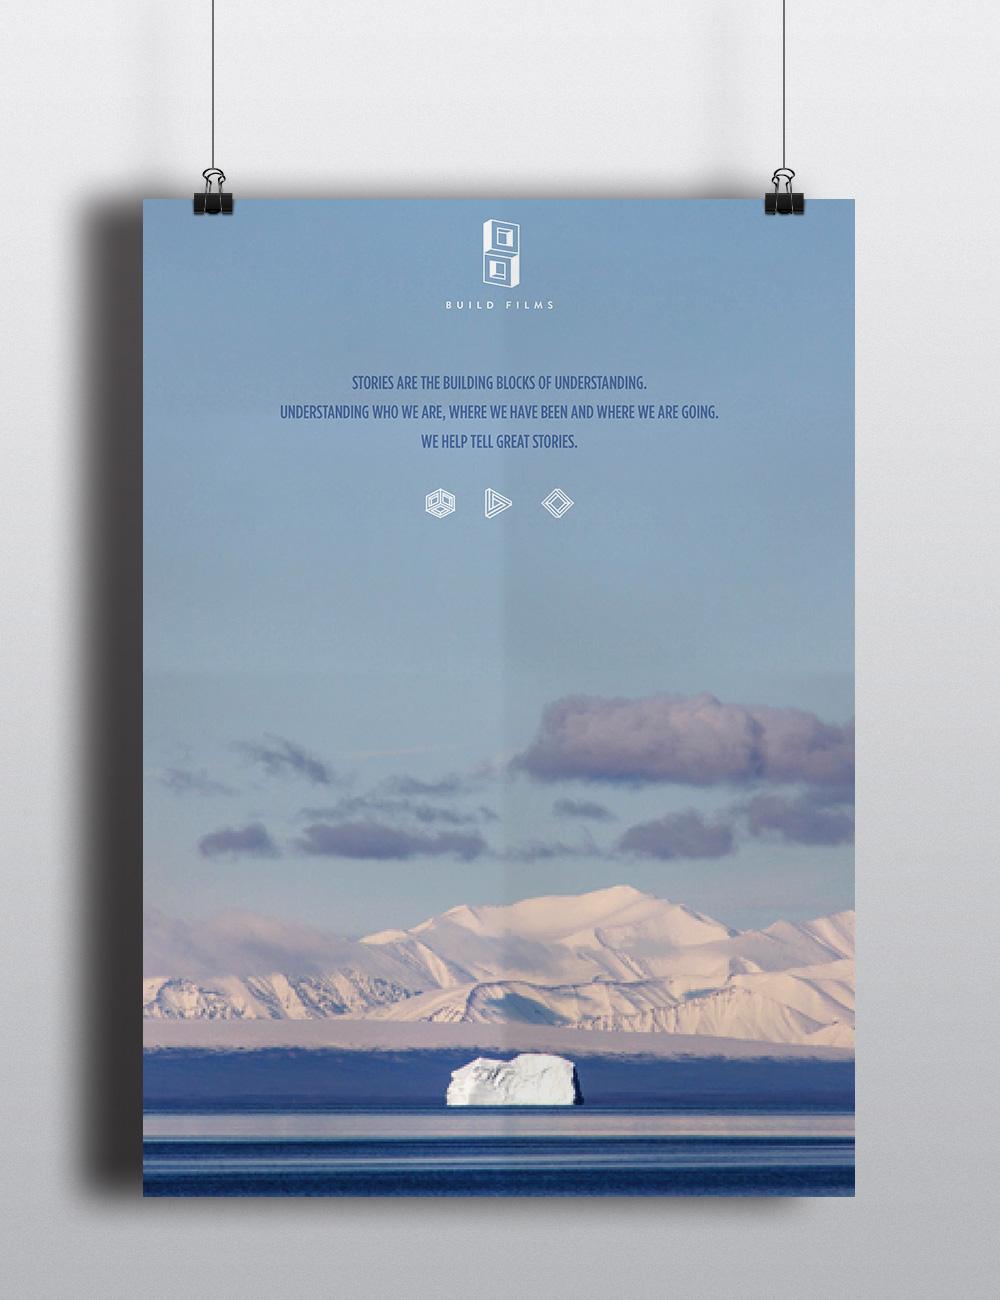 Build Films brochure, poster